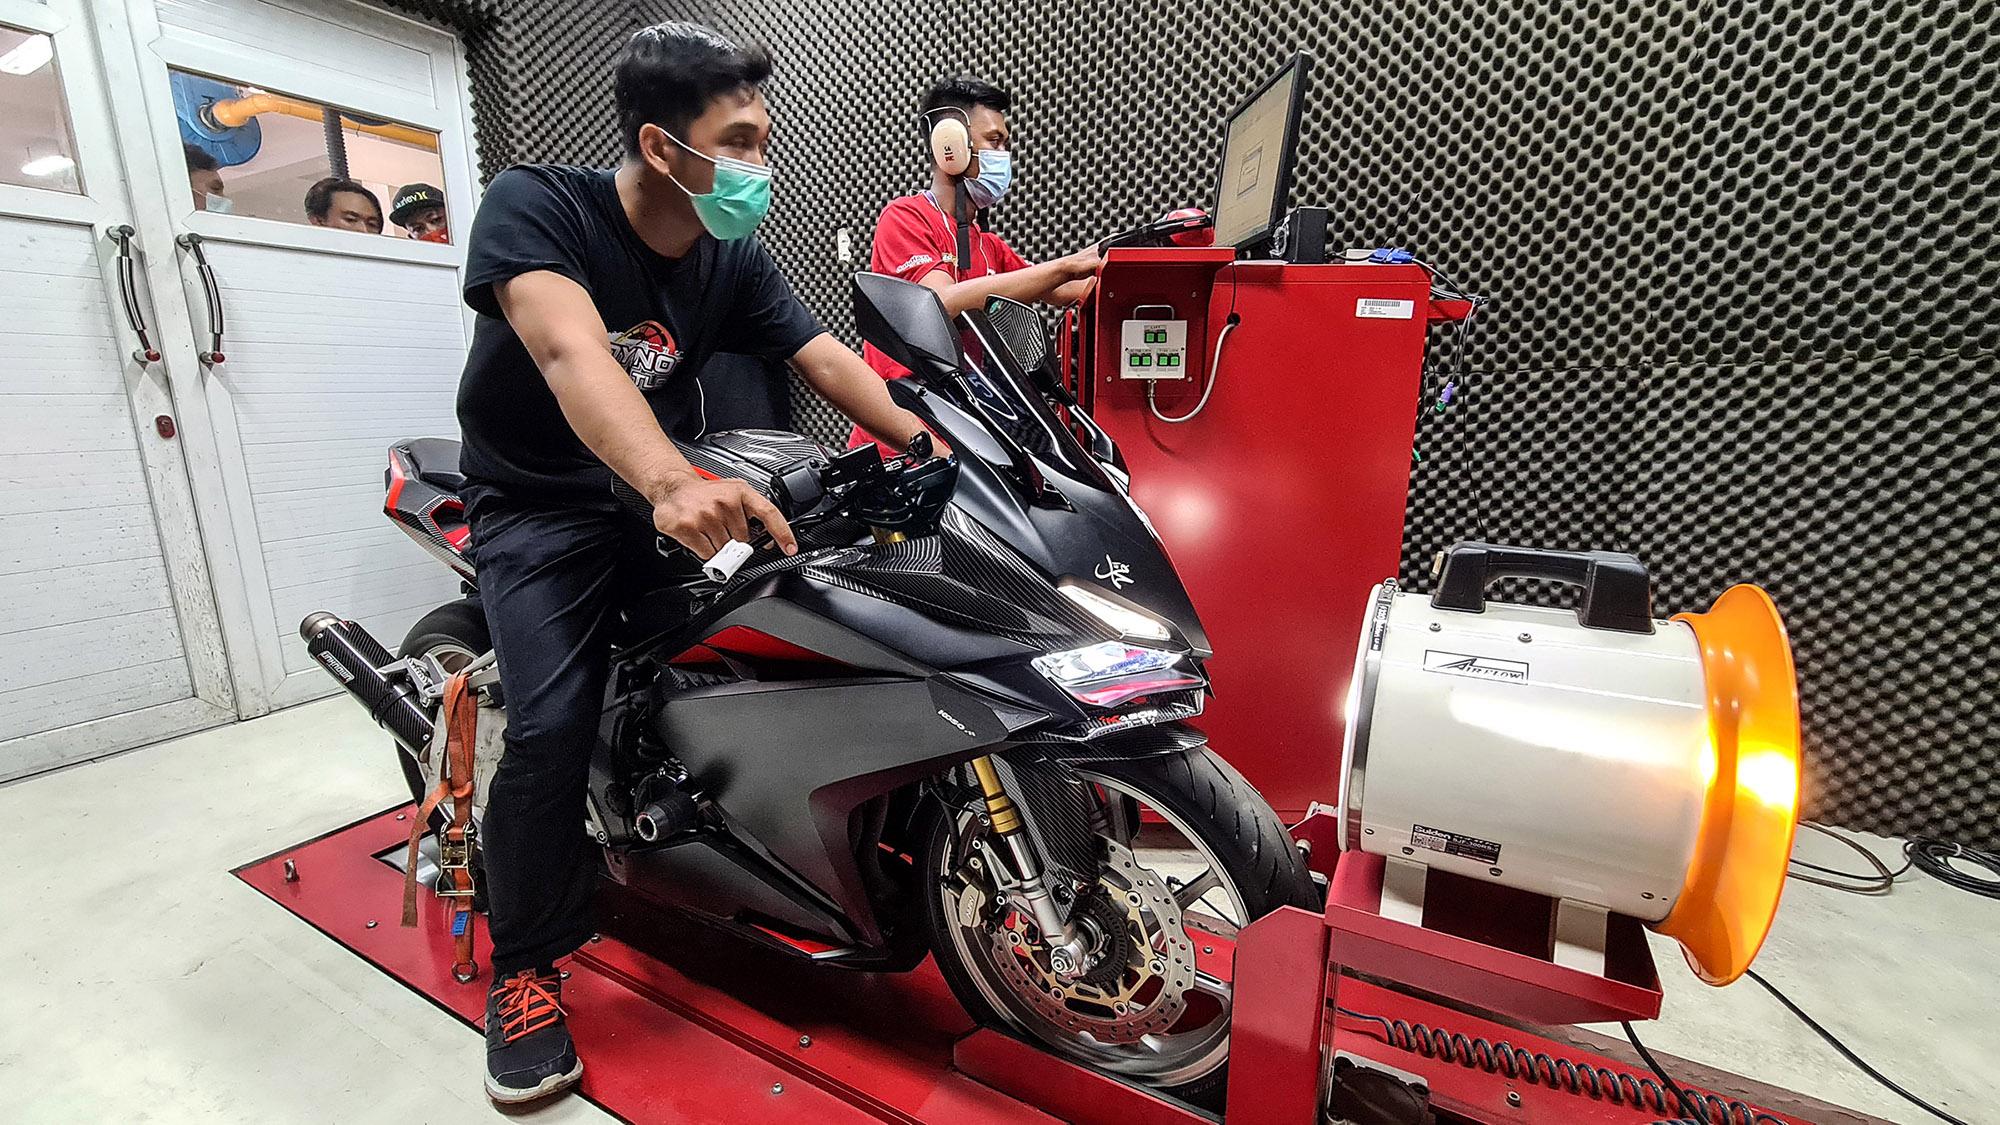 Adu Power CBR Dalam Honda Dyno Battle Di Yogyakarta